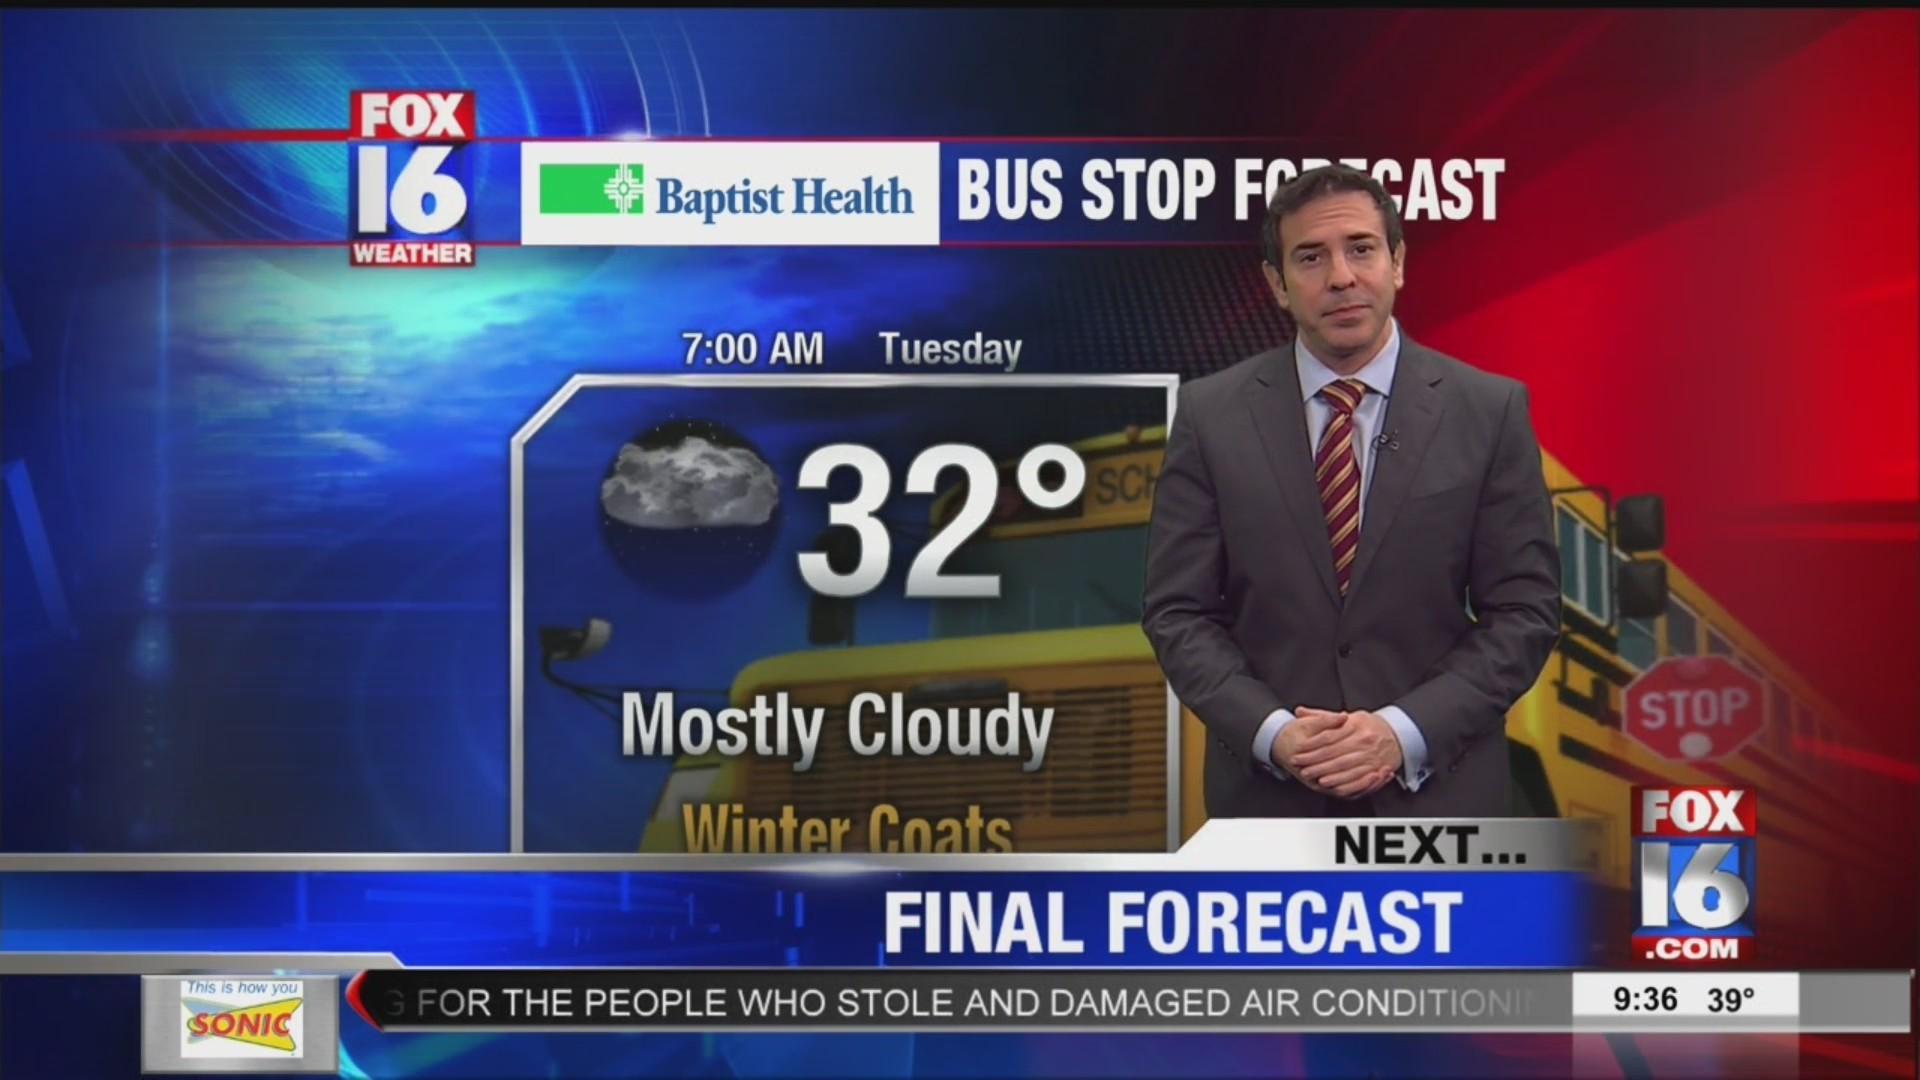 Bus_Stop_Forecast_Jan_15_4_20190115040018